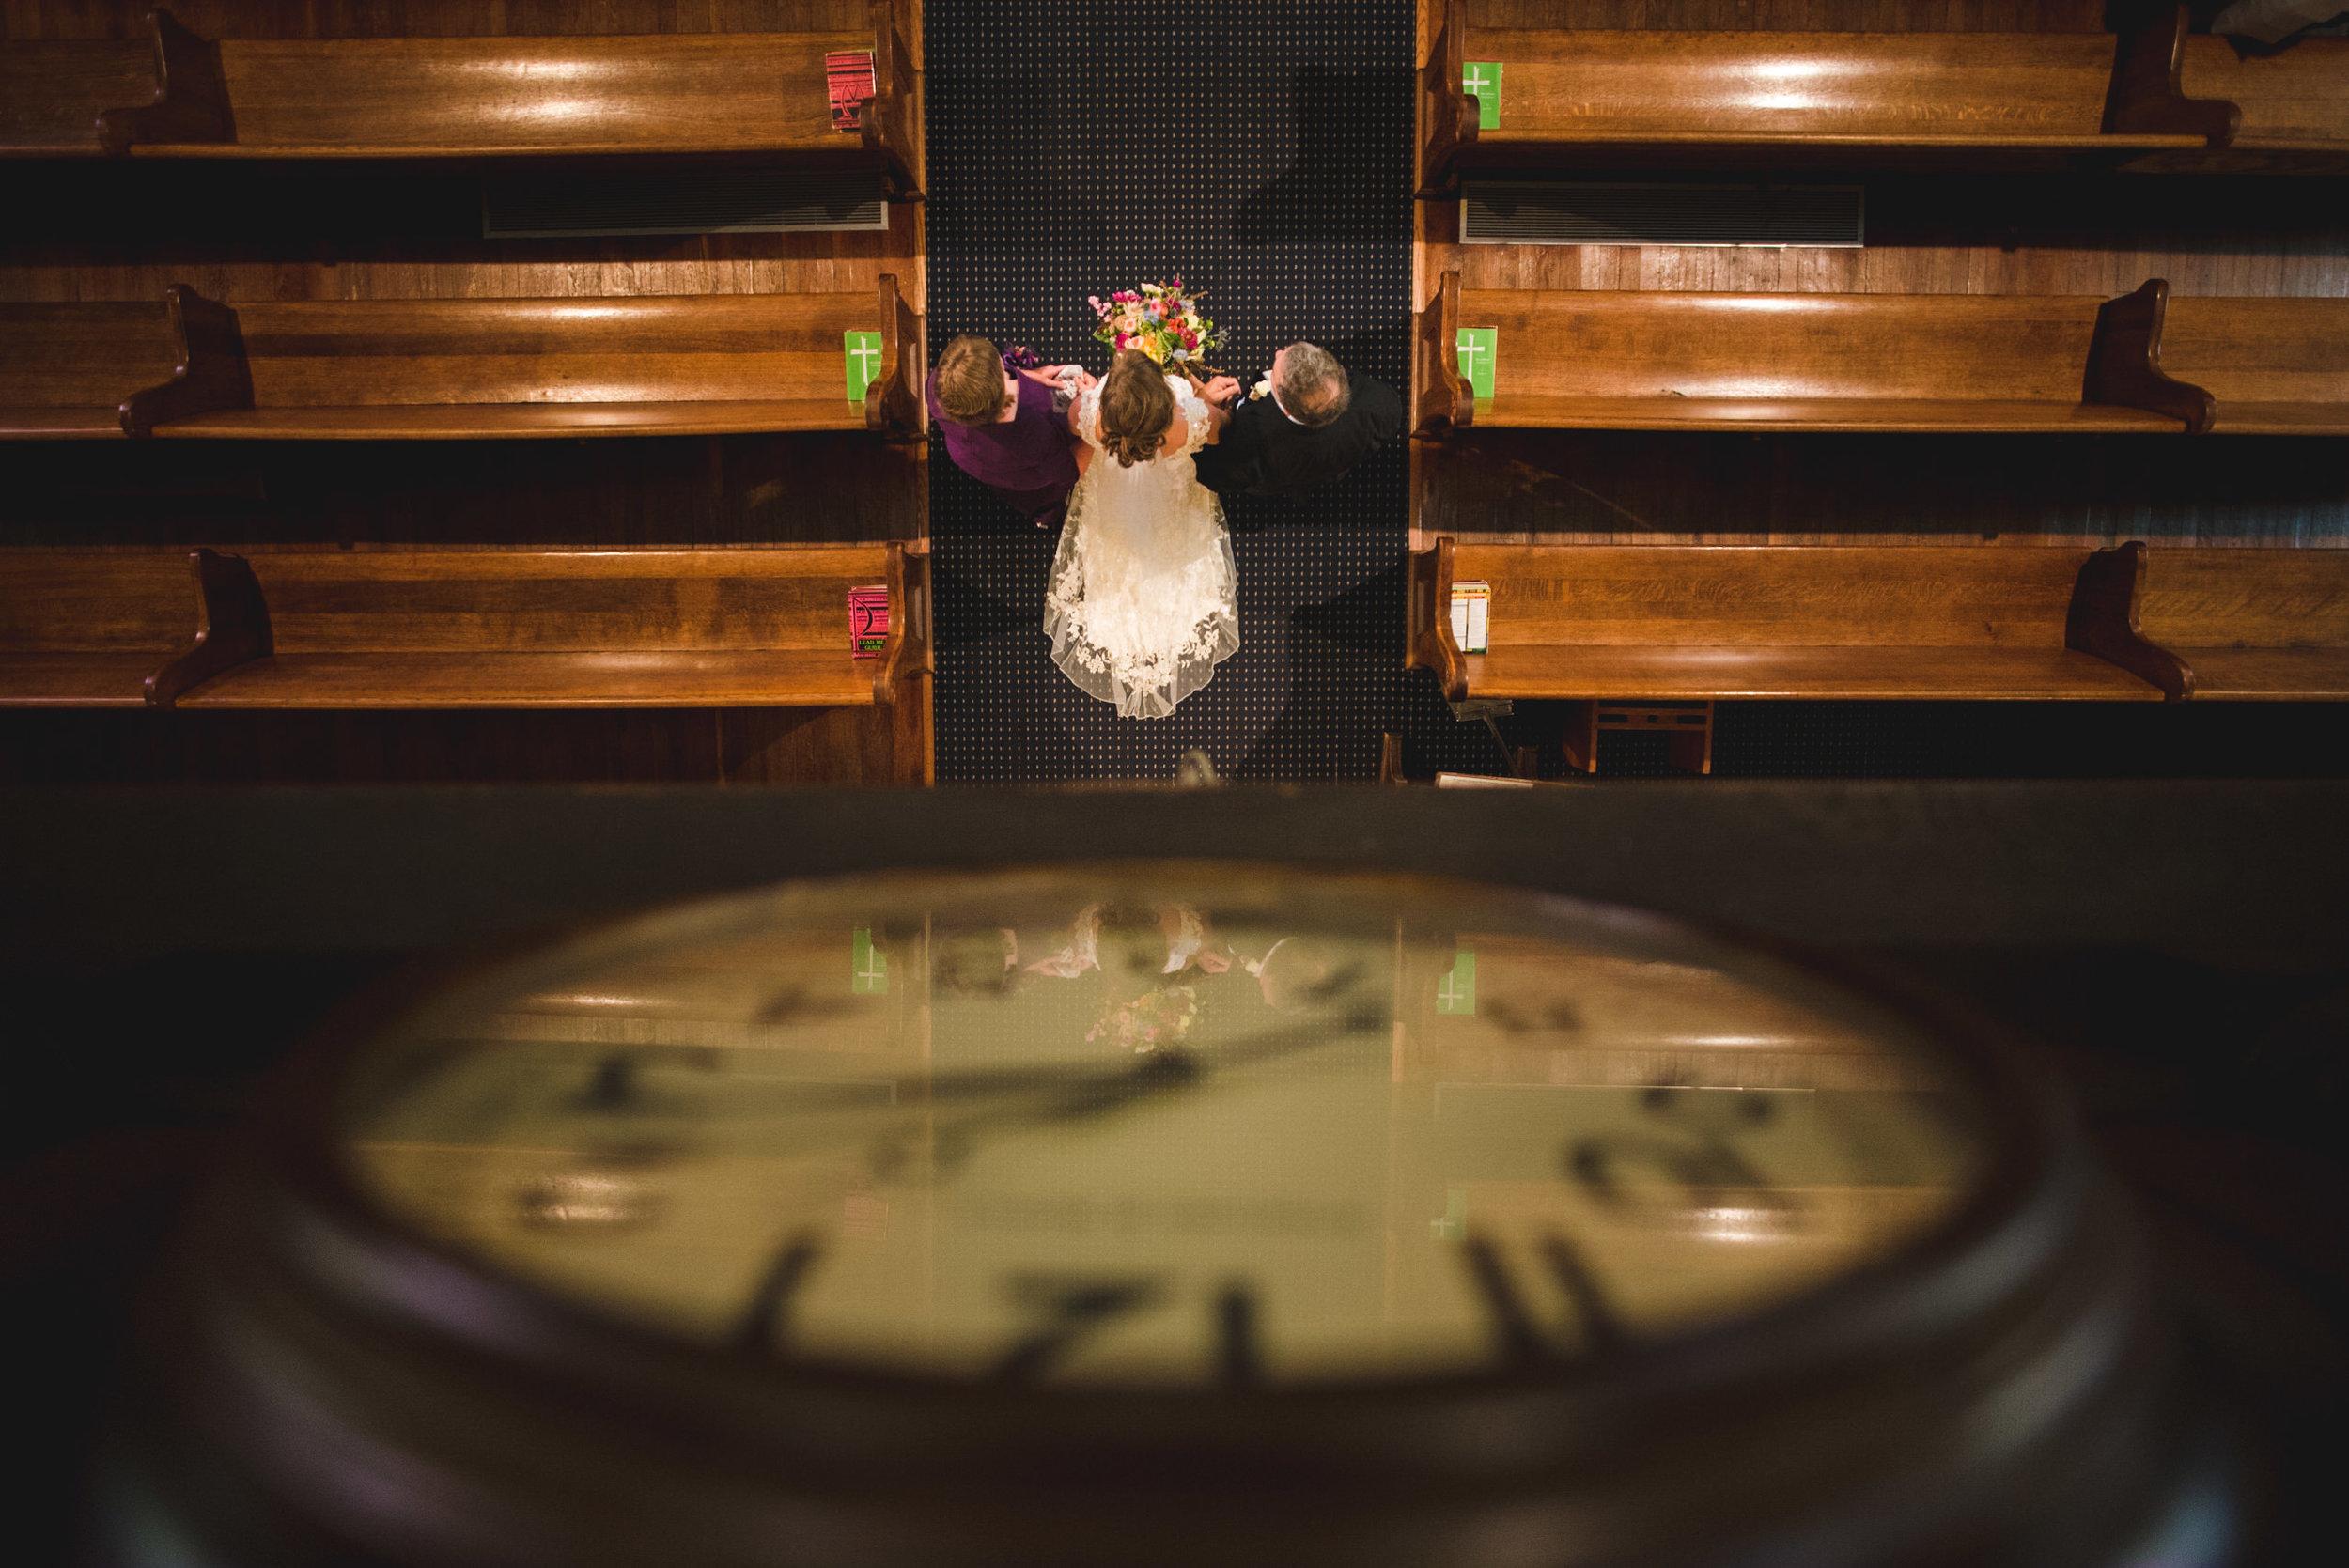 Documentary wedding Photographer Mantas Kubilinskas.jpg